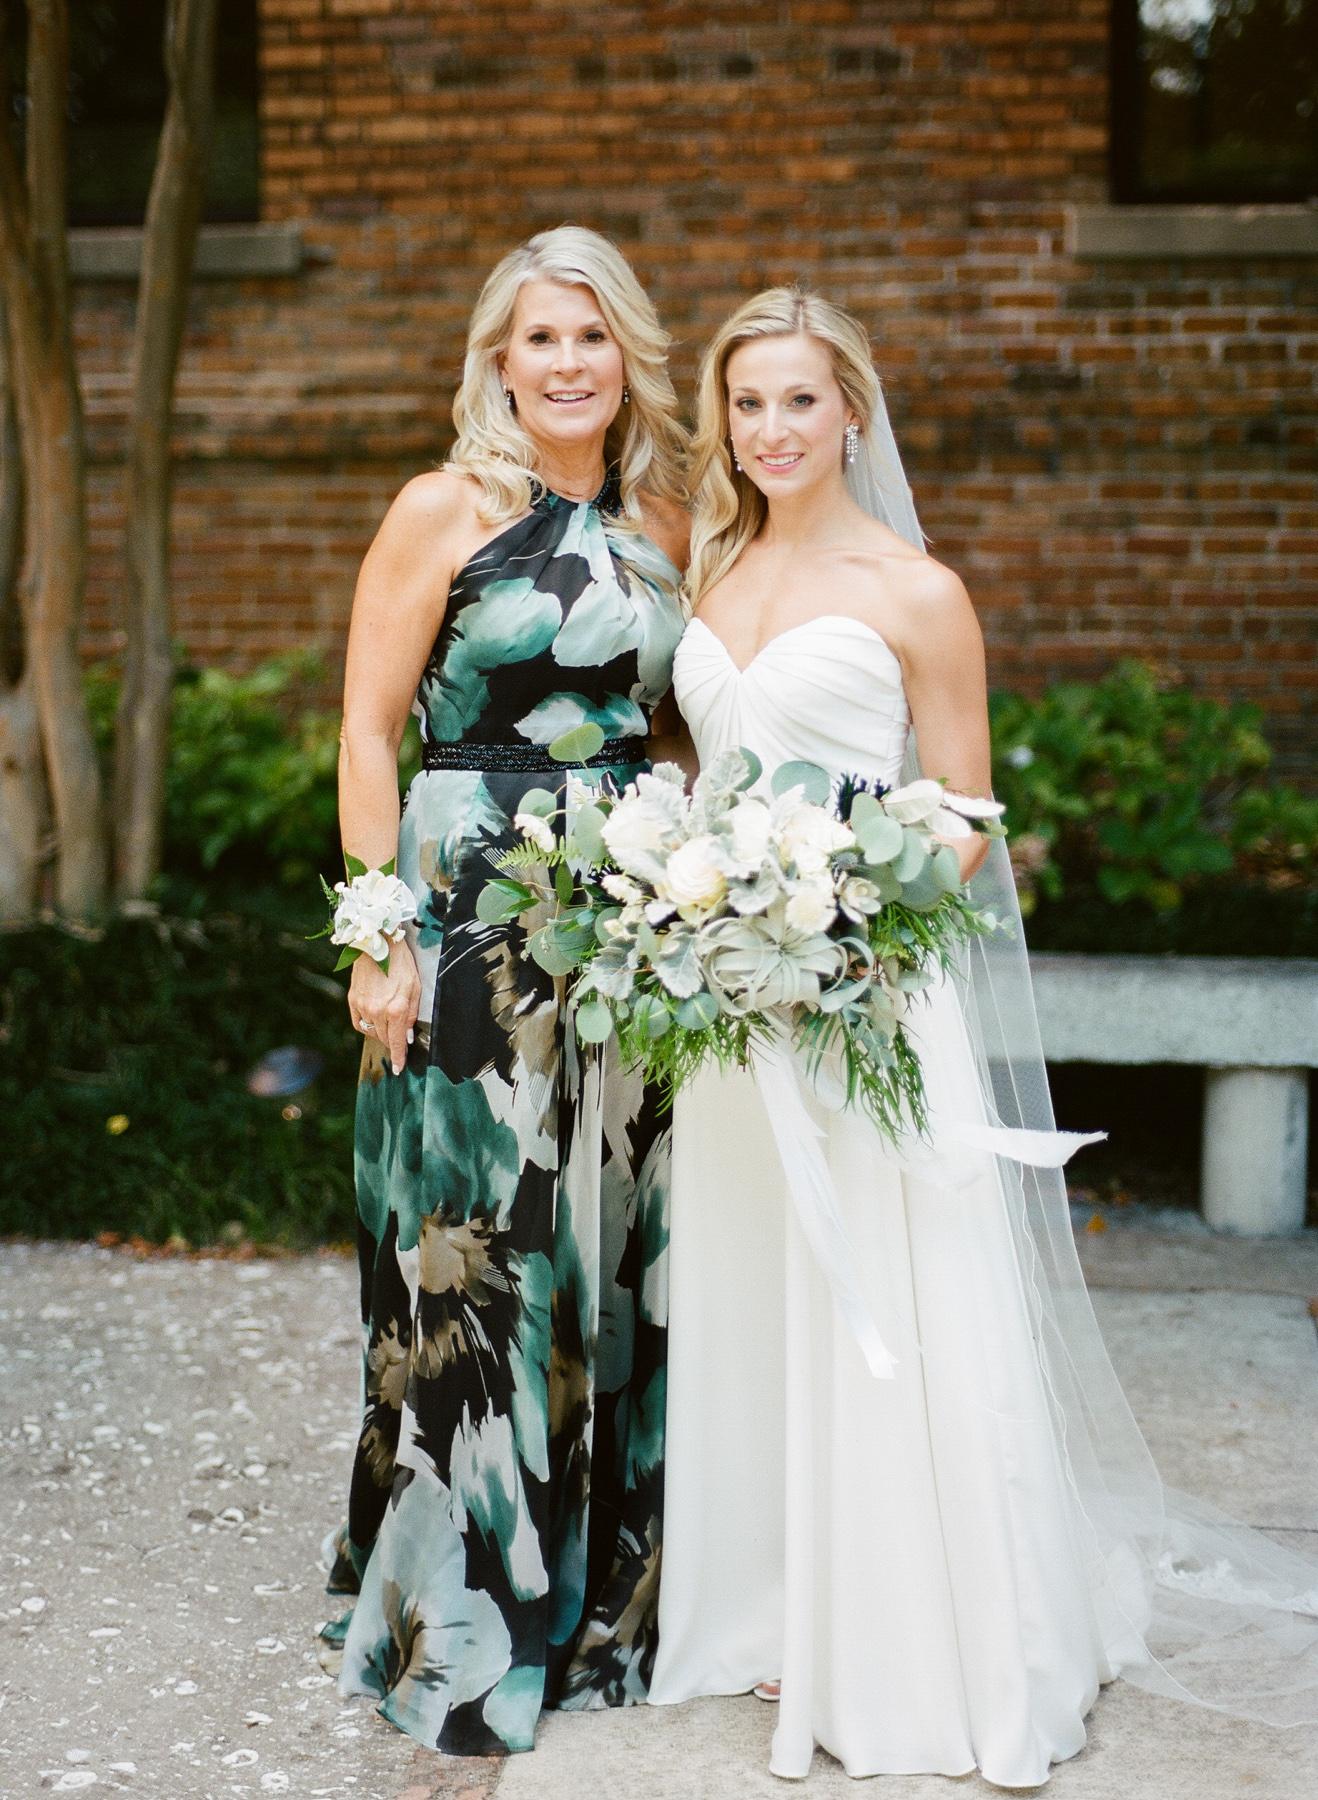 NC-wedding-venues-film-photographer-25.jpg